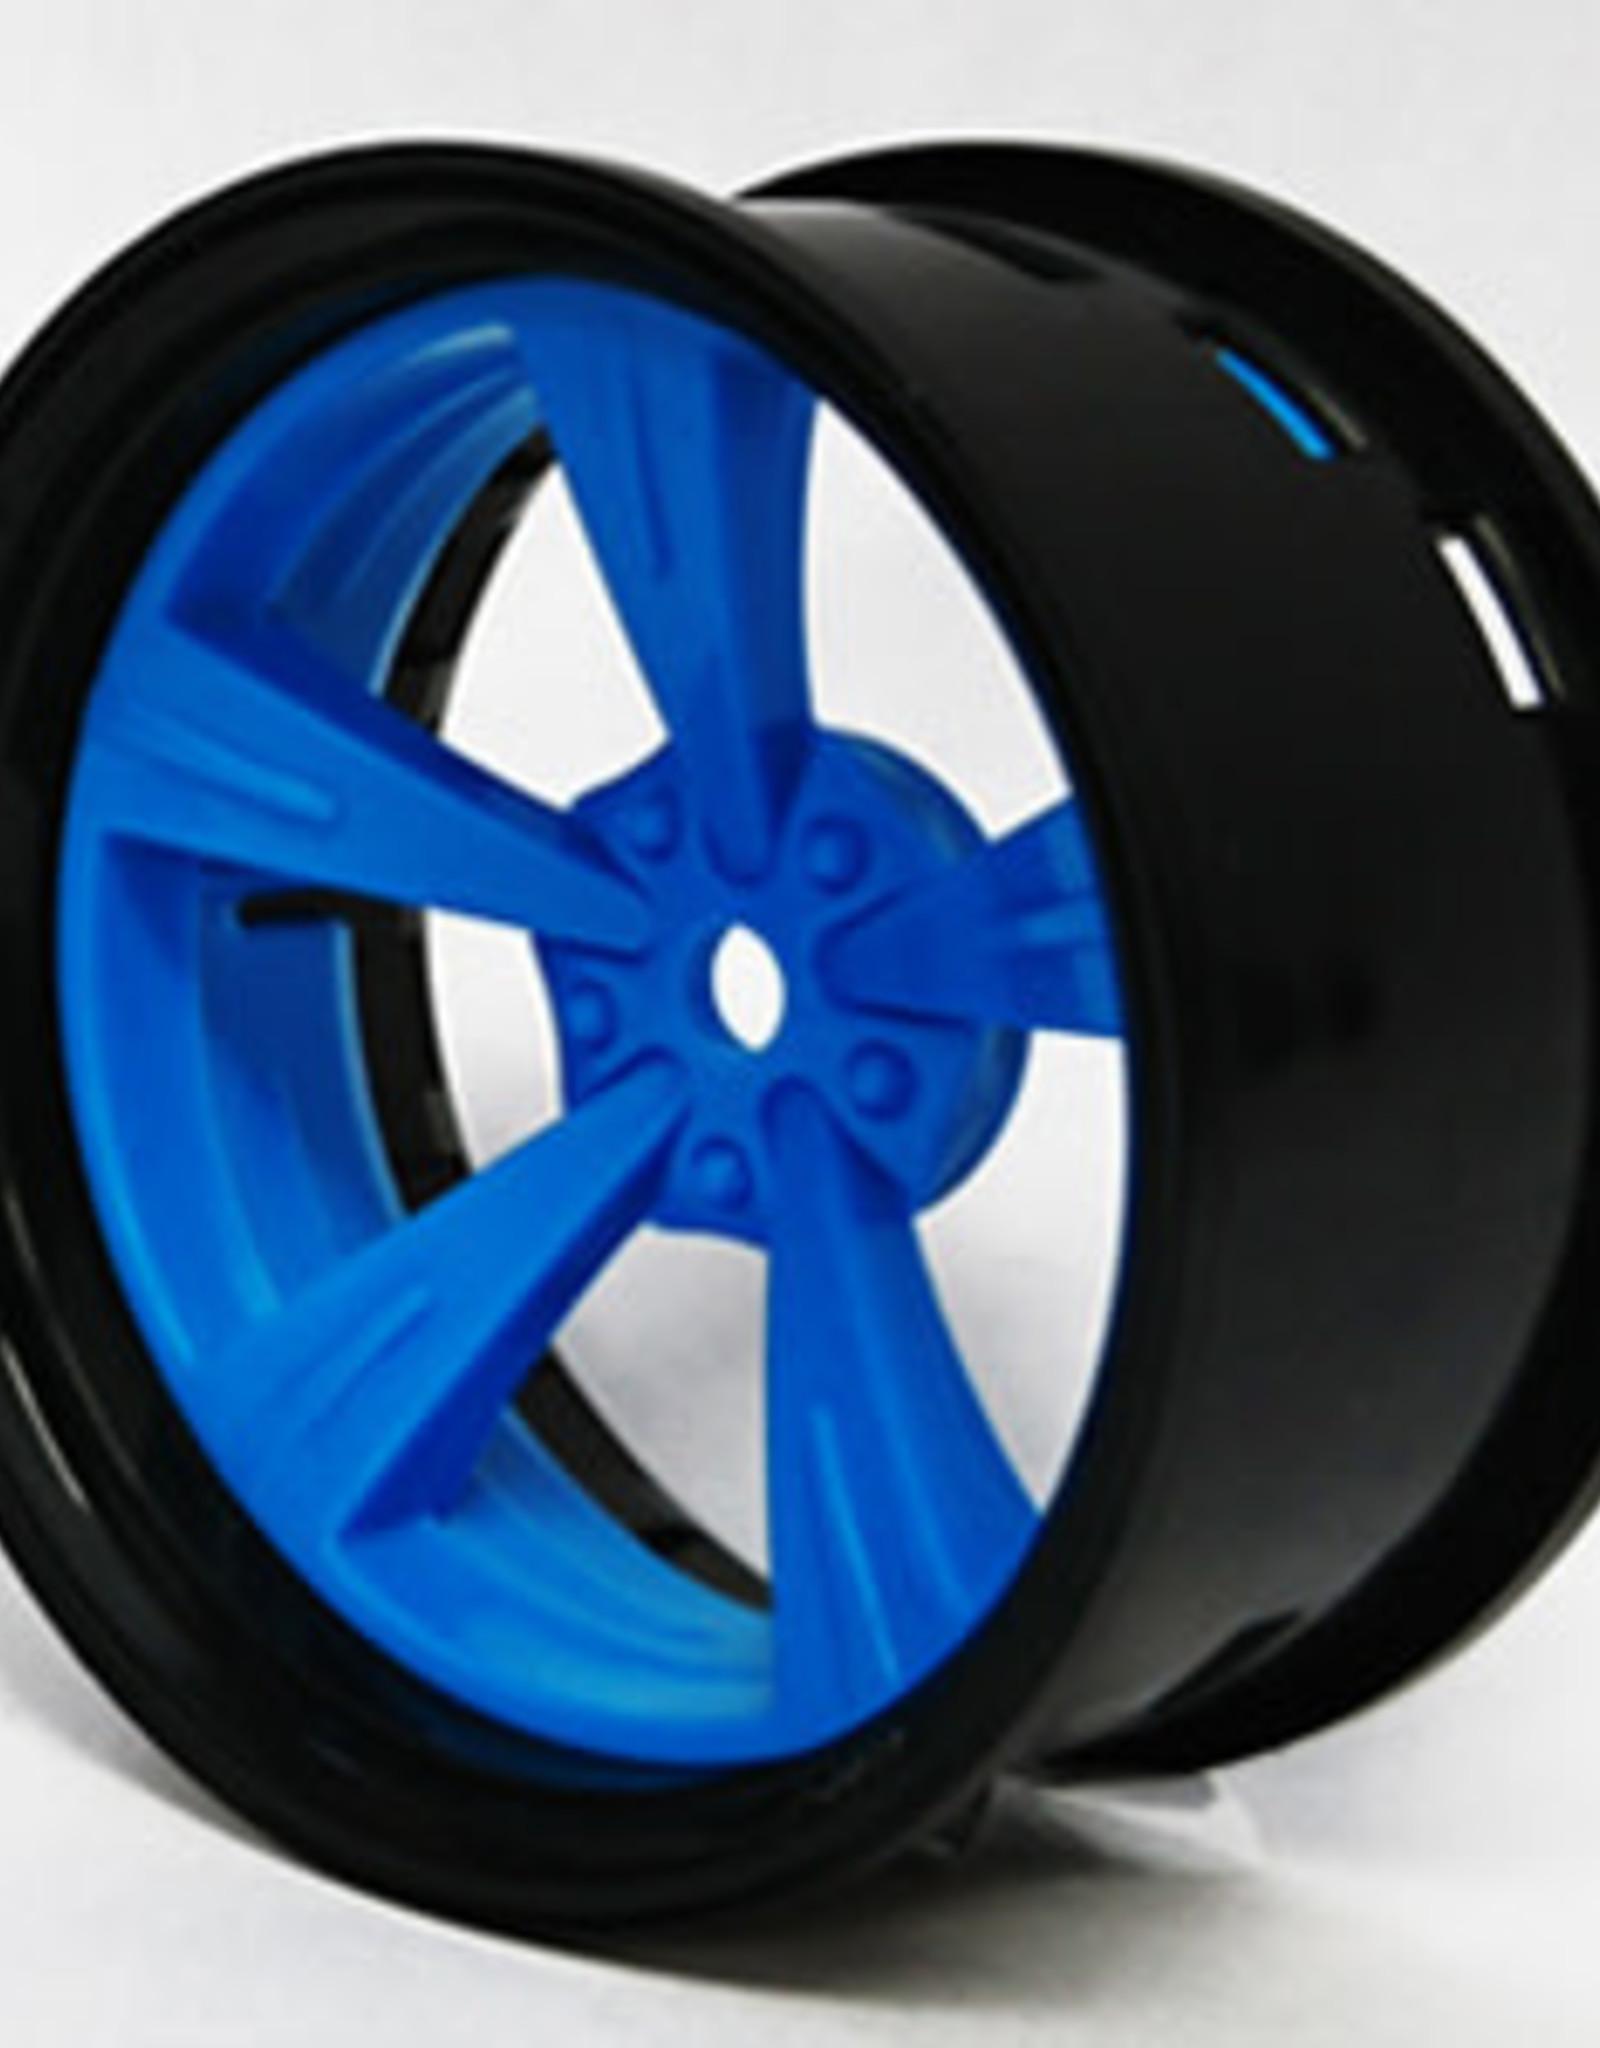 Tetsujin TT-7650 Super Rim Set Black Rim/ Blue Madarin 2pcs. by Tetsujin